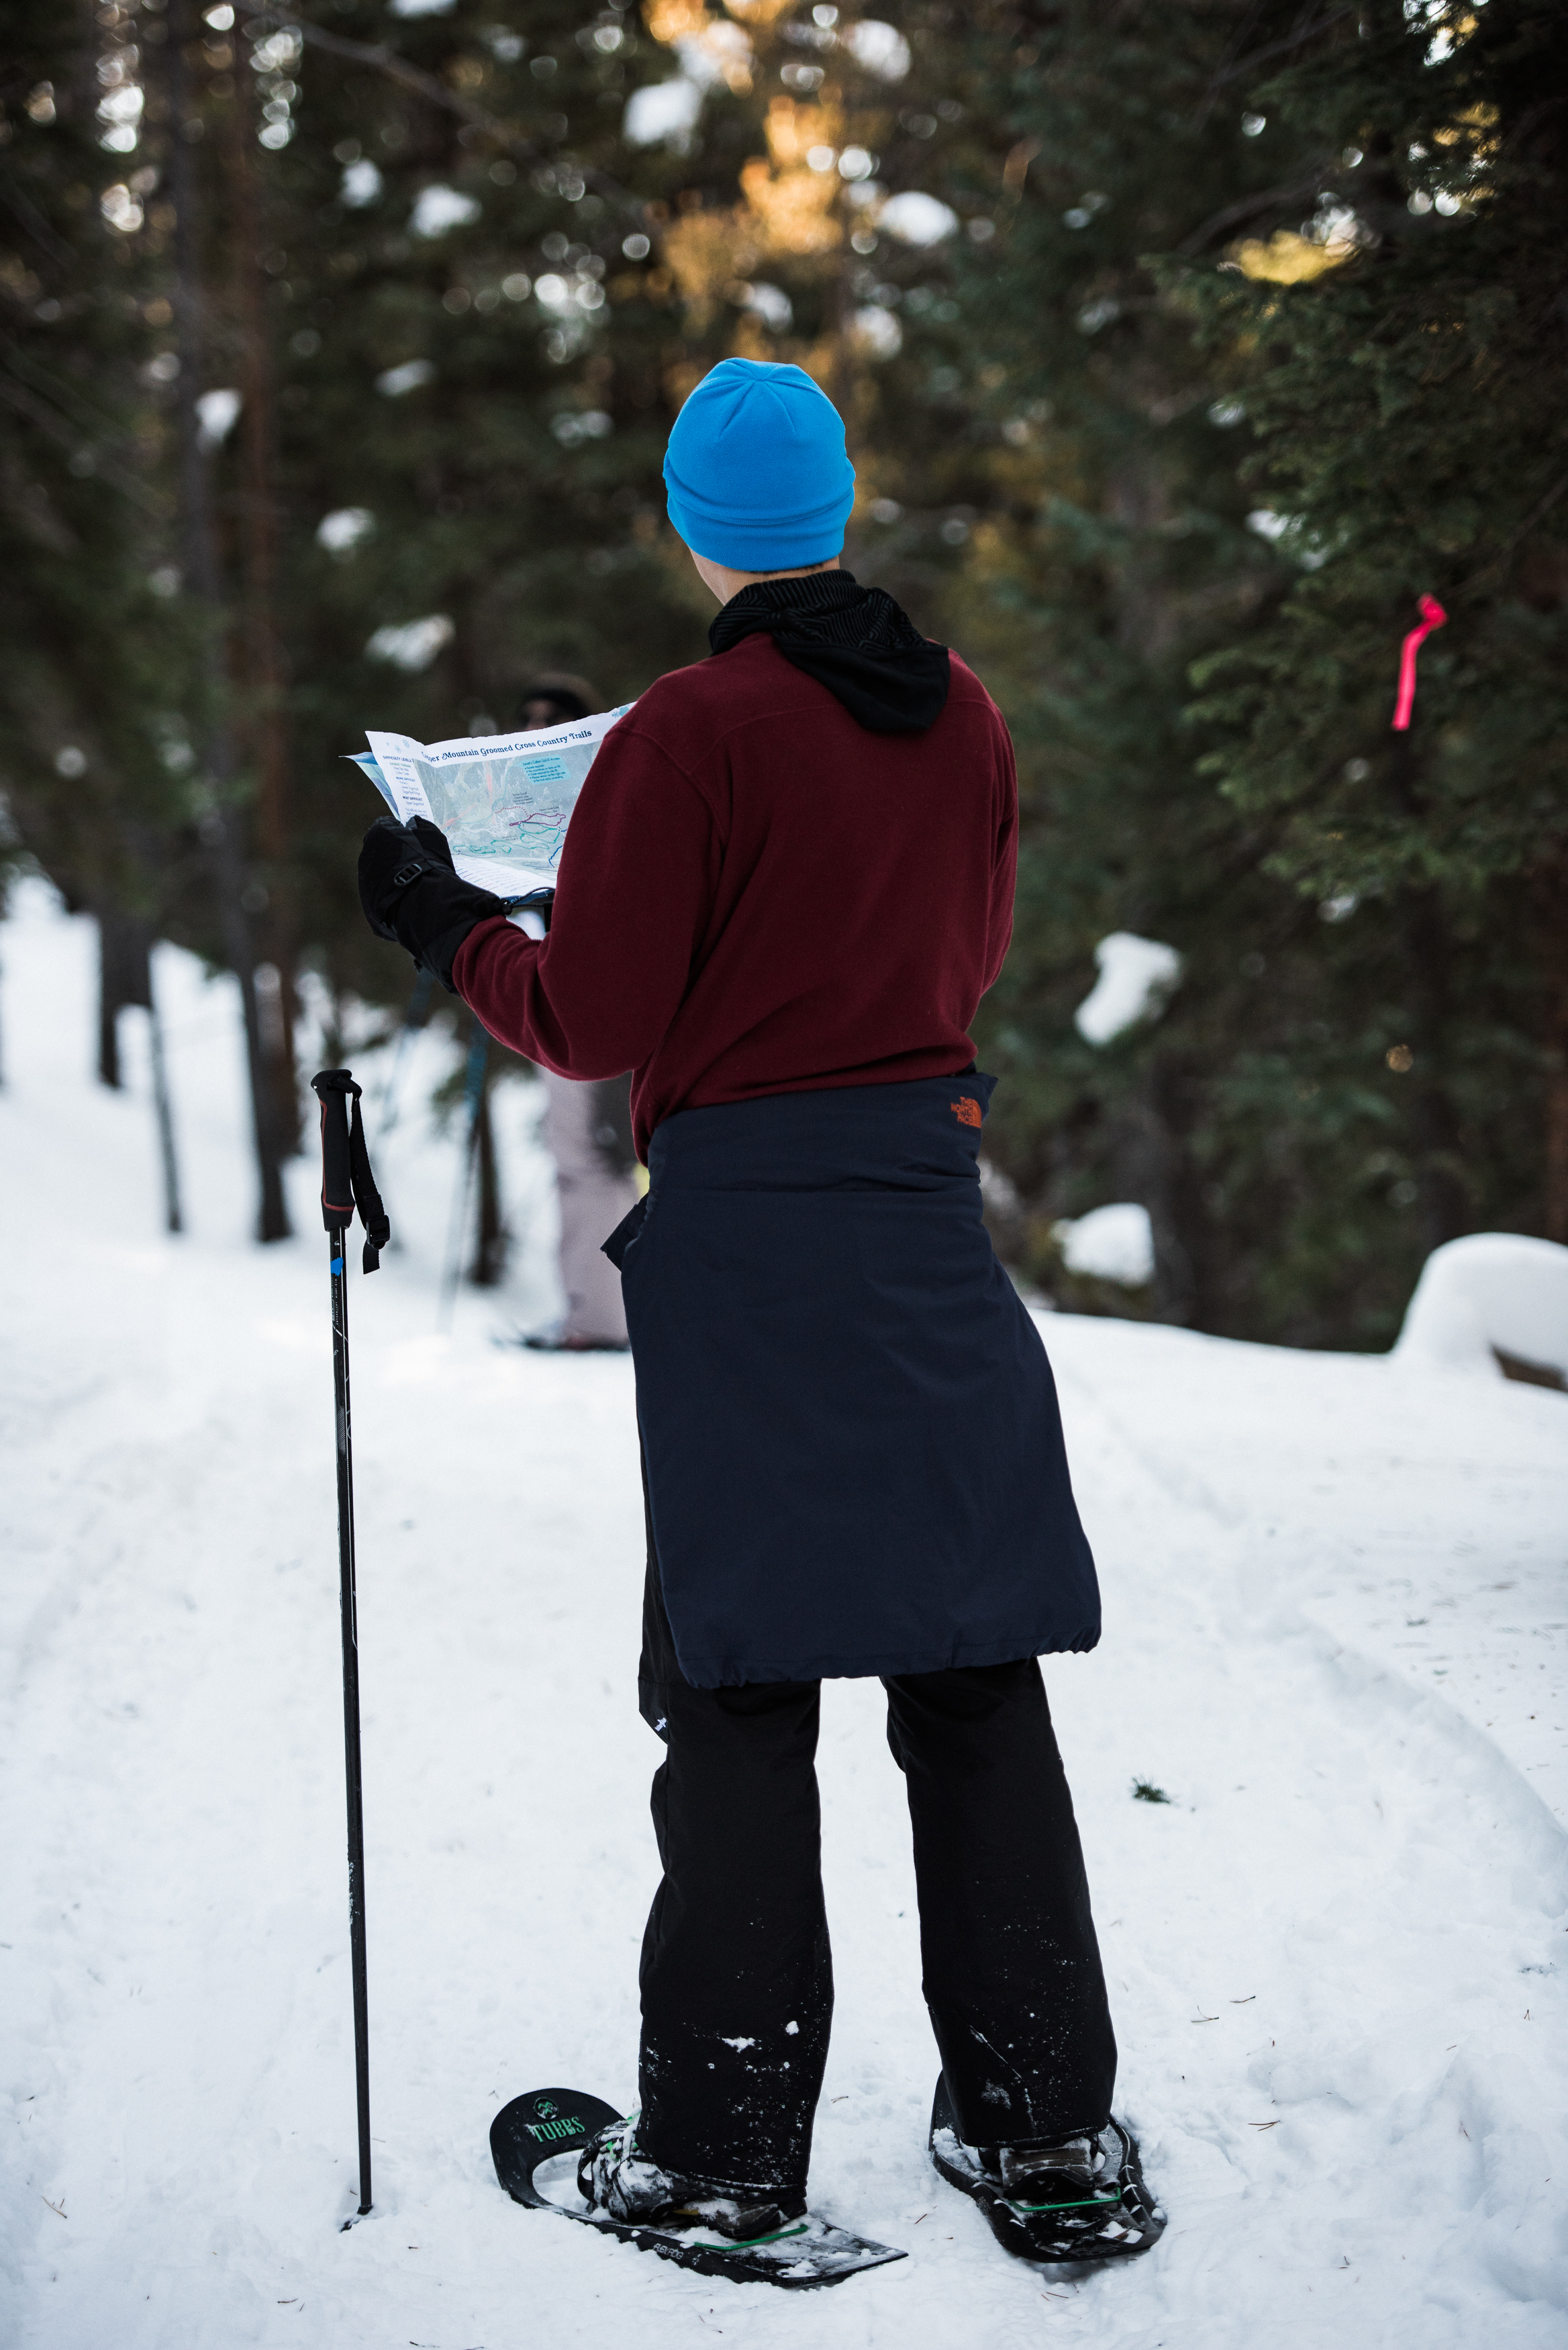 TaraShupe_Outdoor_Photographer_Loweprobags_Colorado_Copper_Mountains_Ski_90.jpg